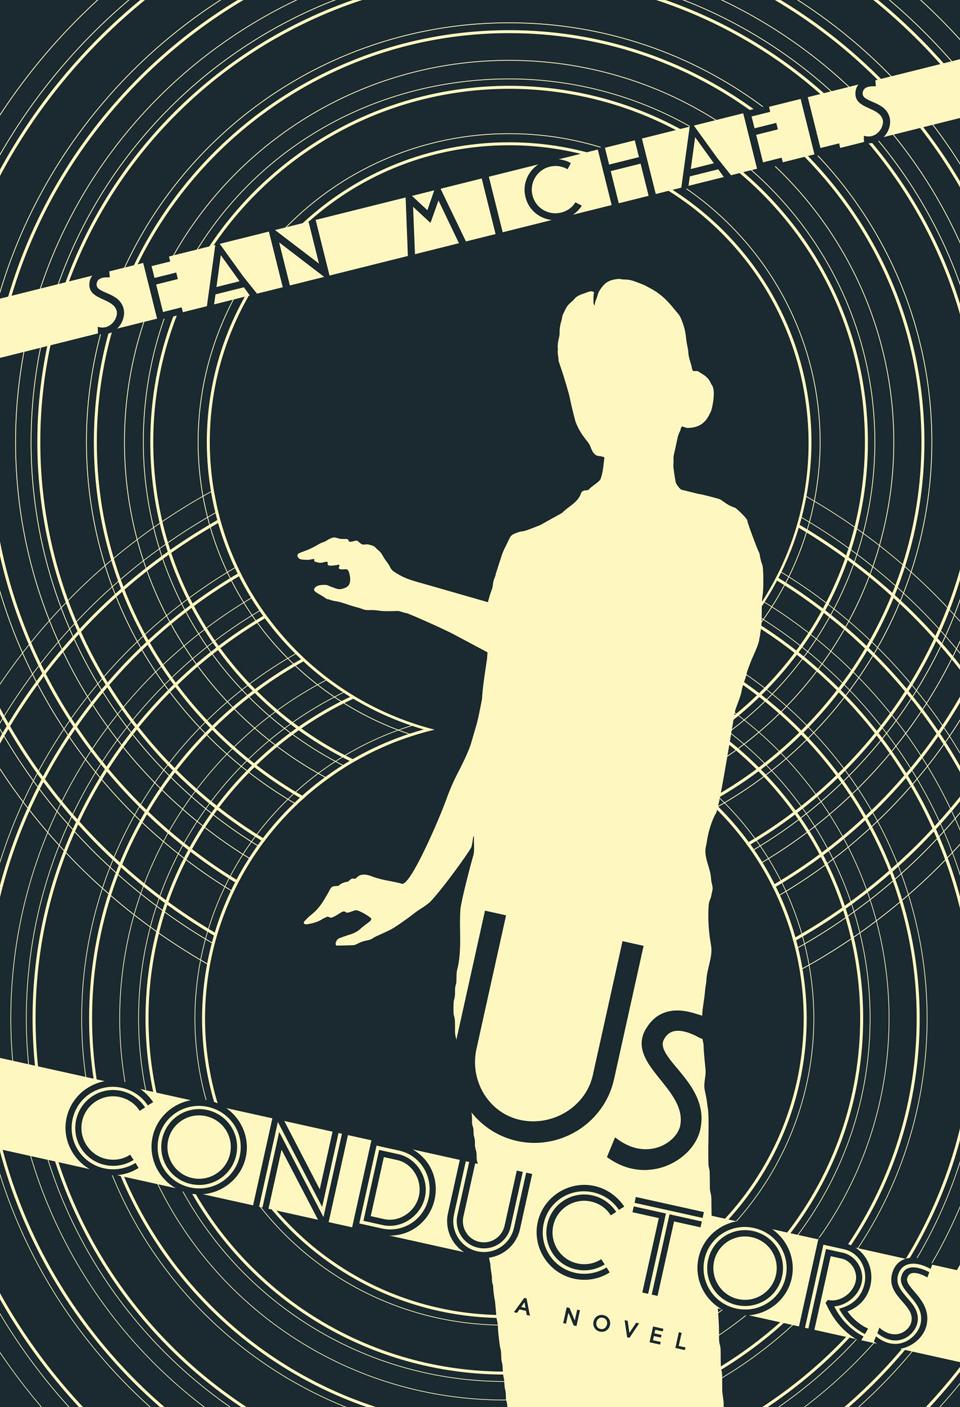 Us Conductors cover